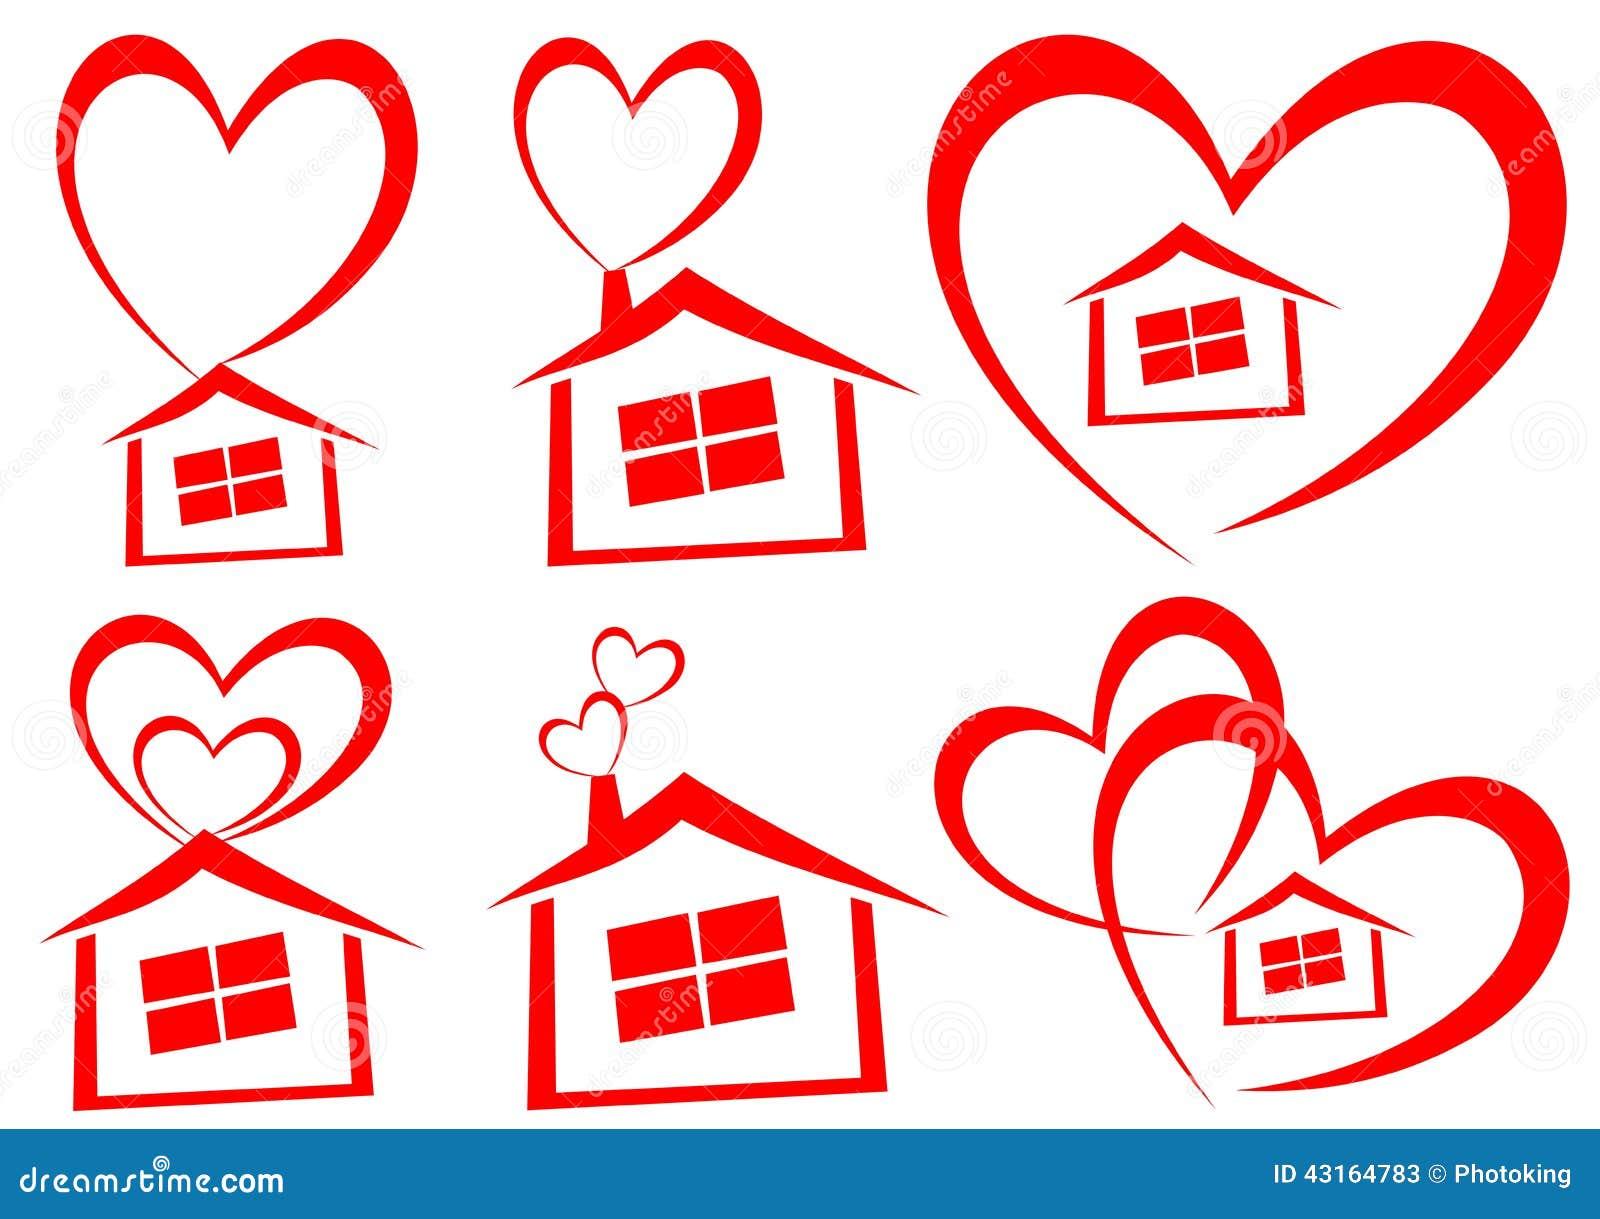 Love home logo vector illustration for Love home designs